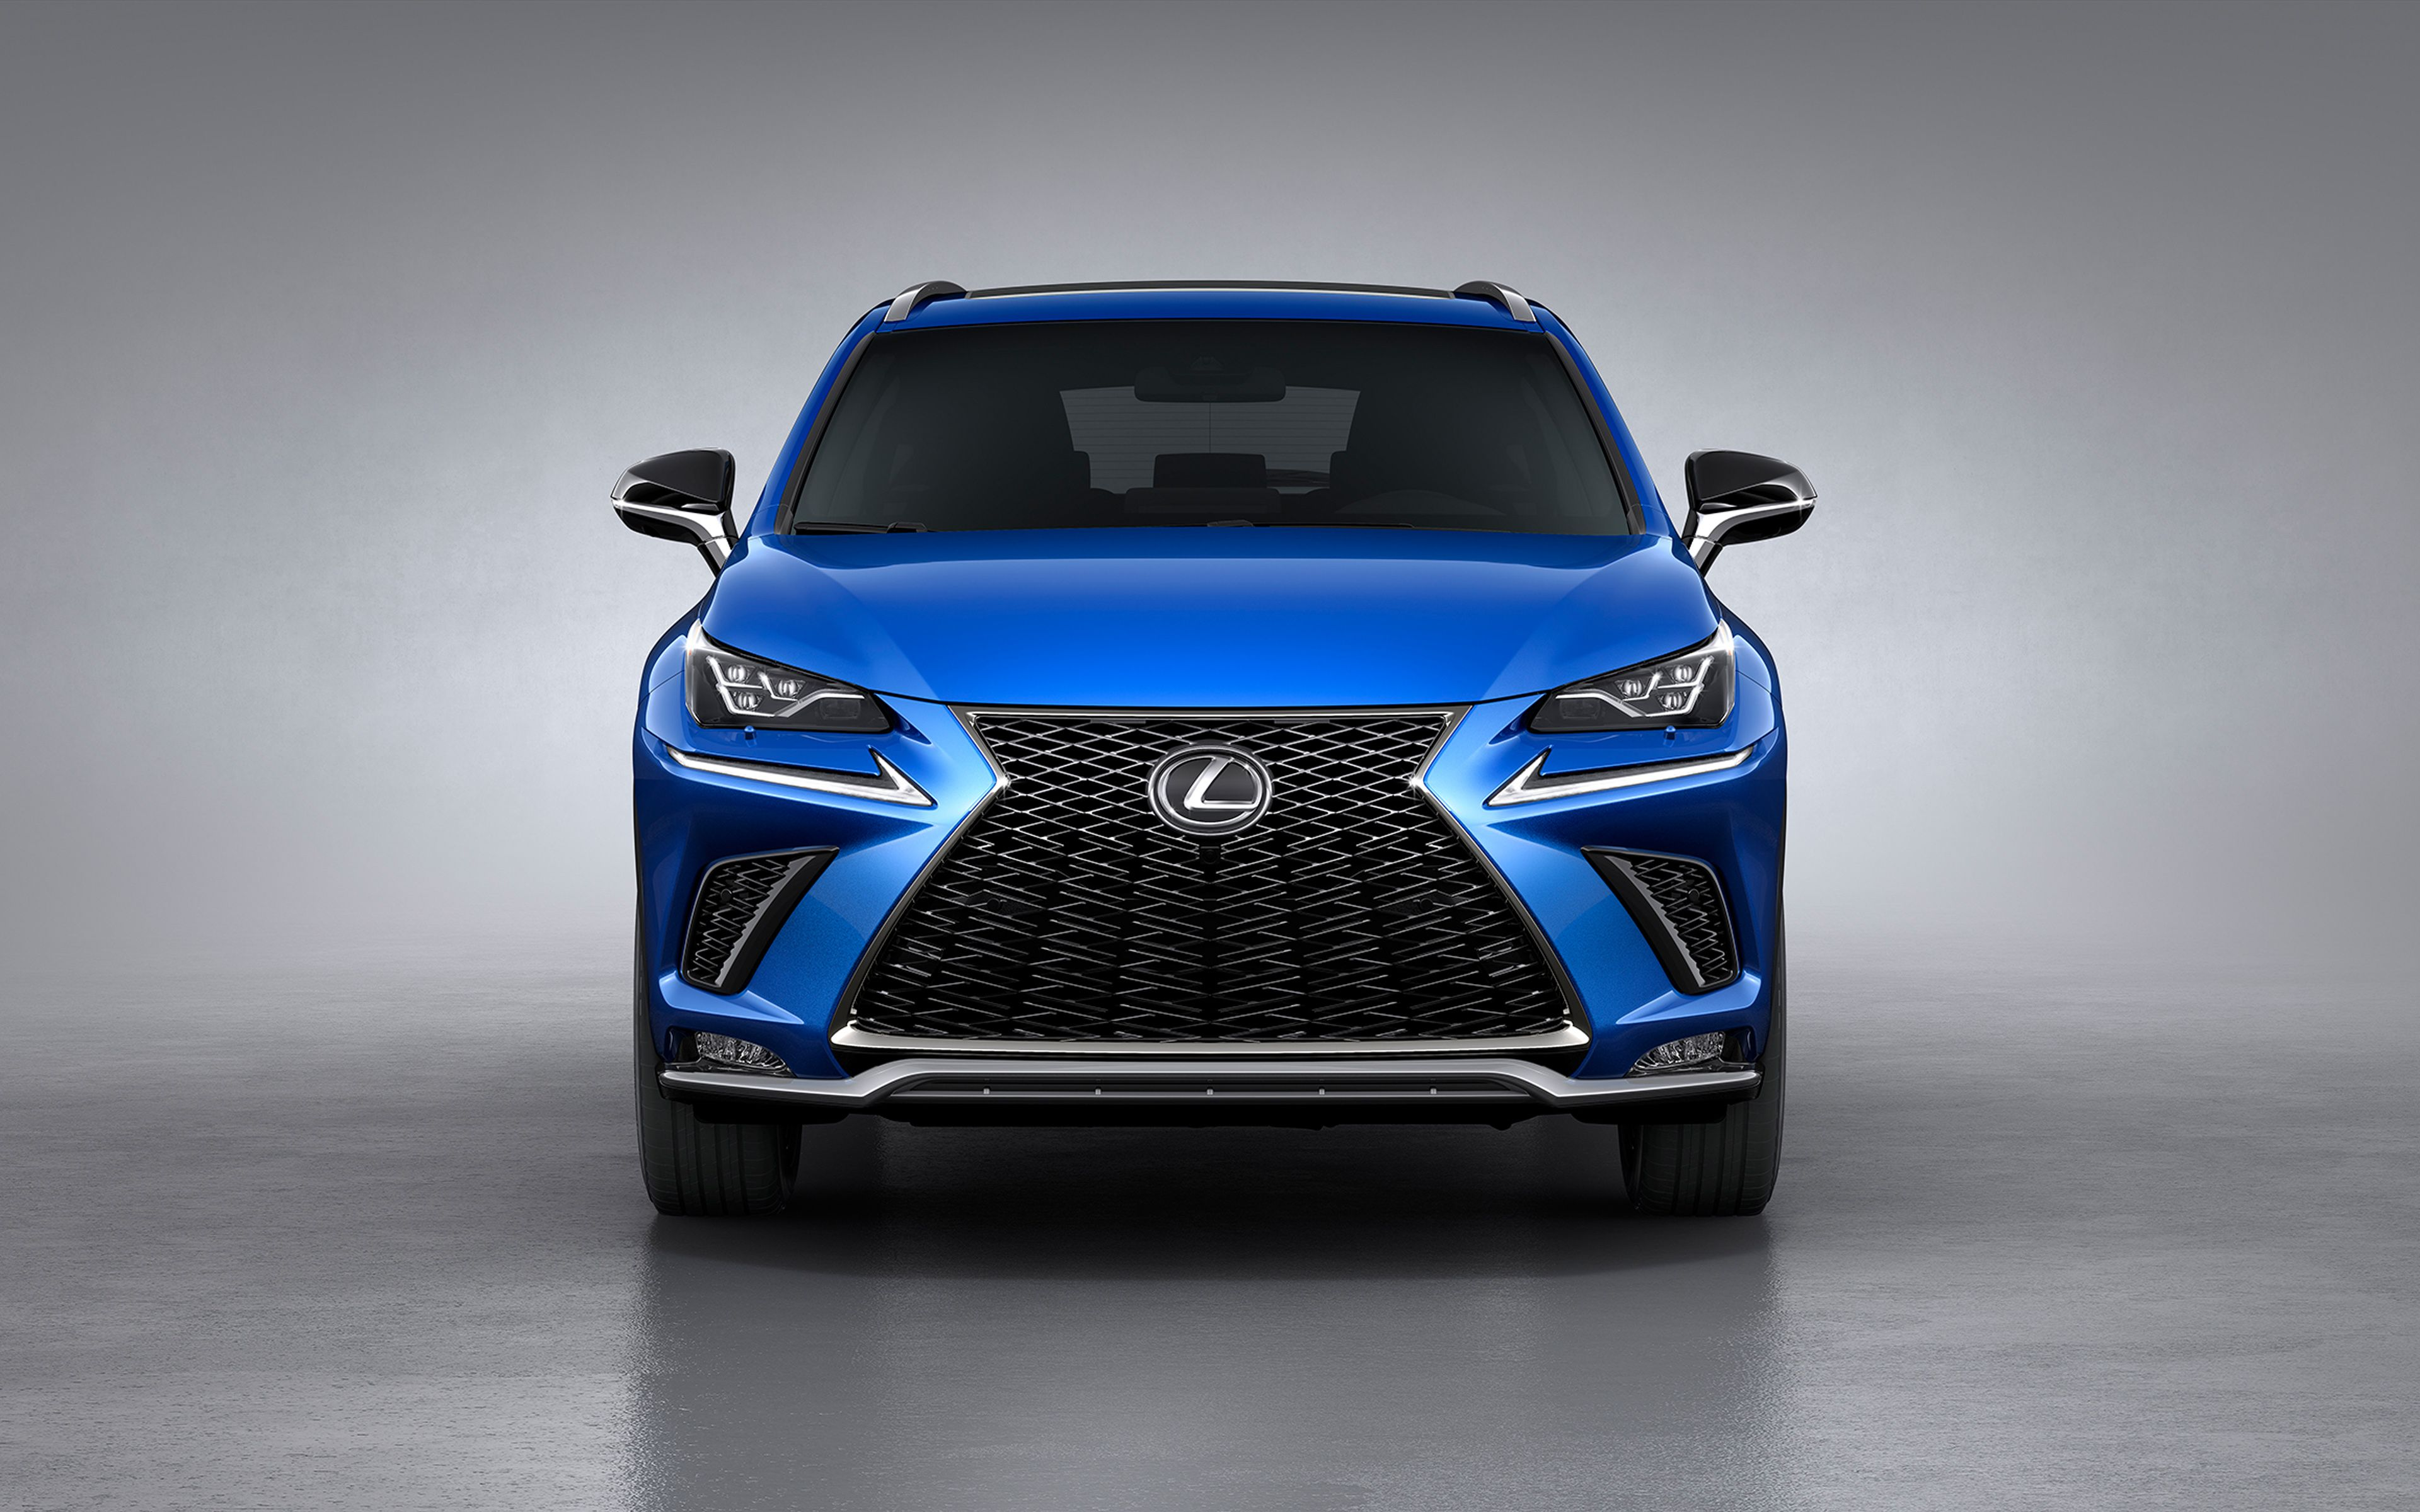 Lexus Nx 2018 4k Front View Facelift Jpg 3840 2400